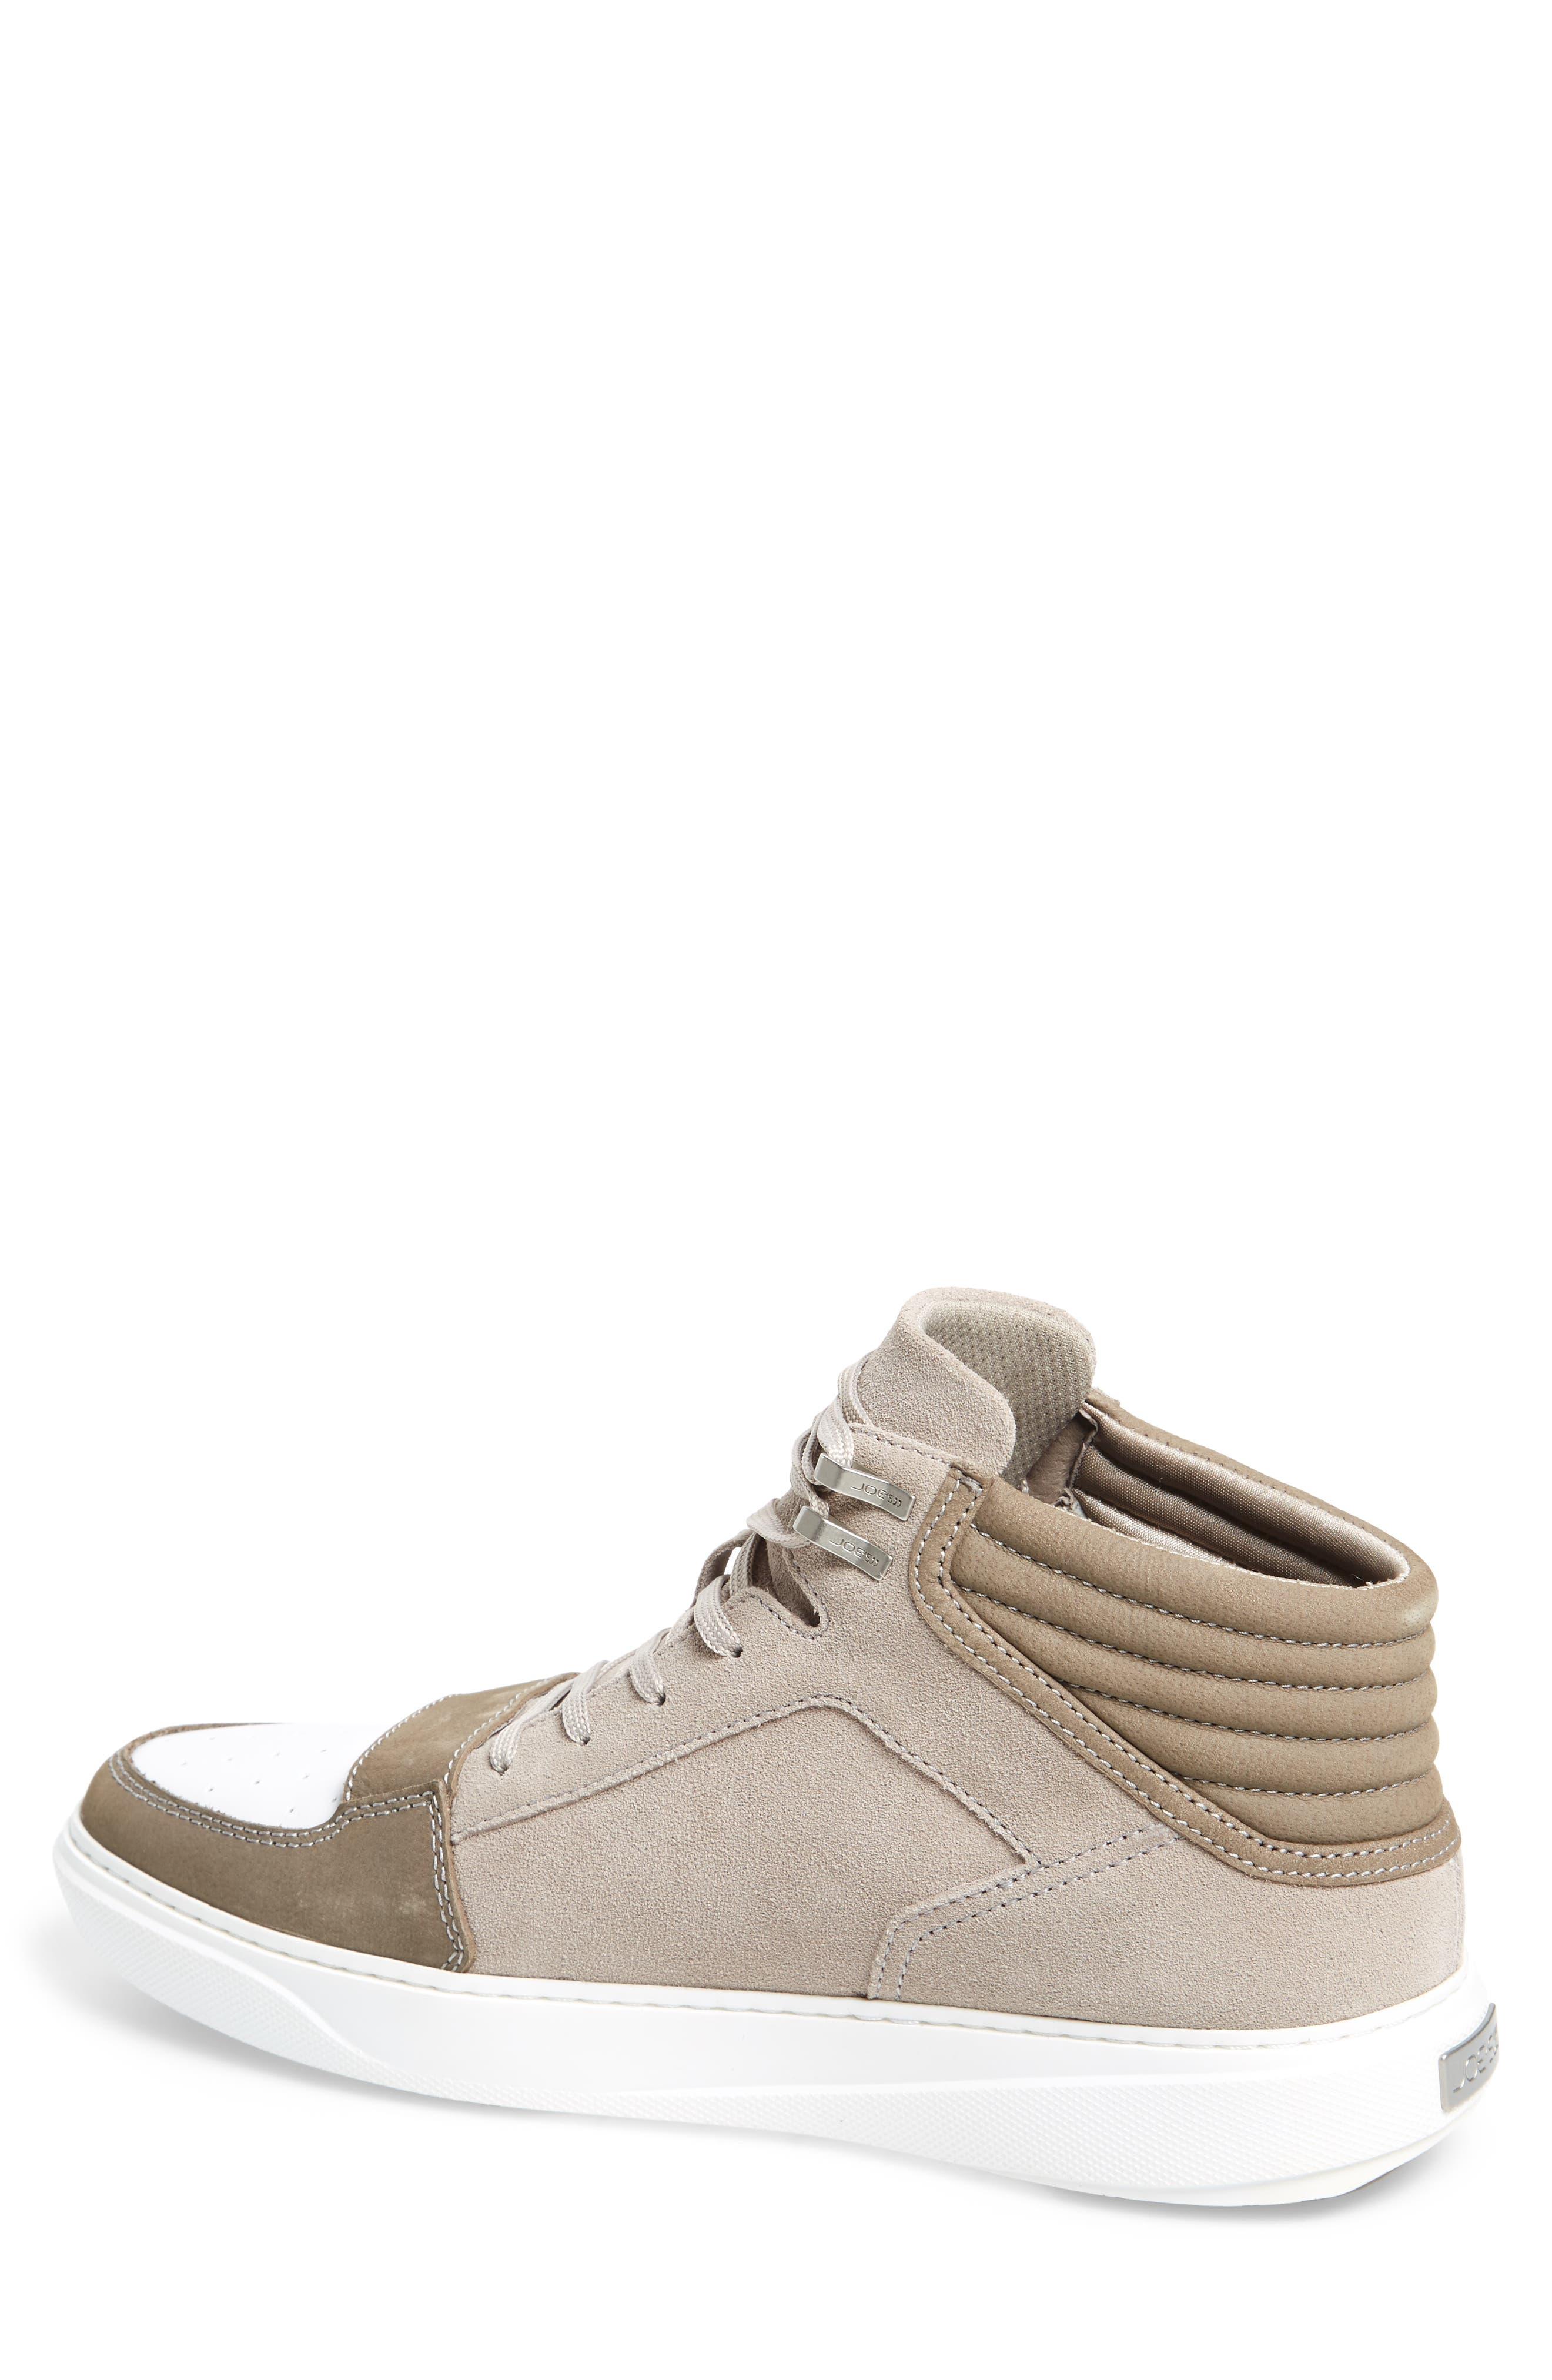 Alternate Image 2  - Joe's Joe L Mid Top Sneaker (Men)